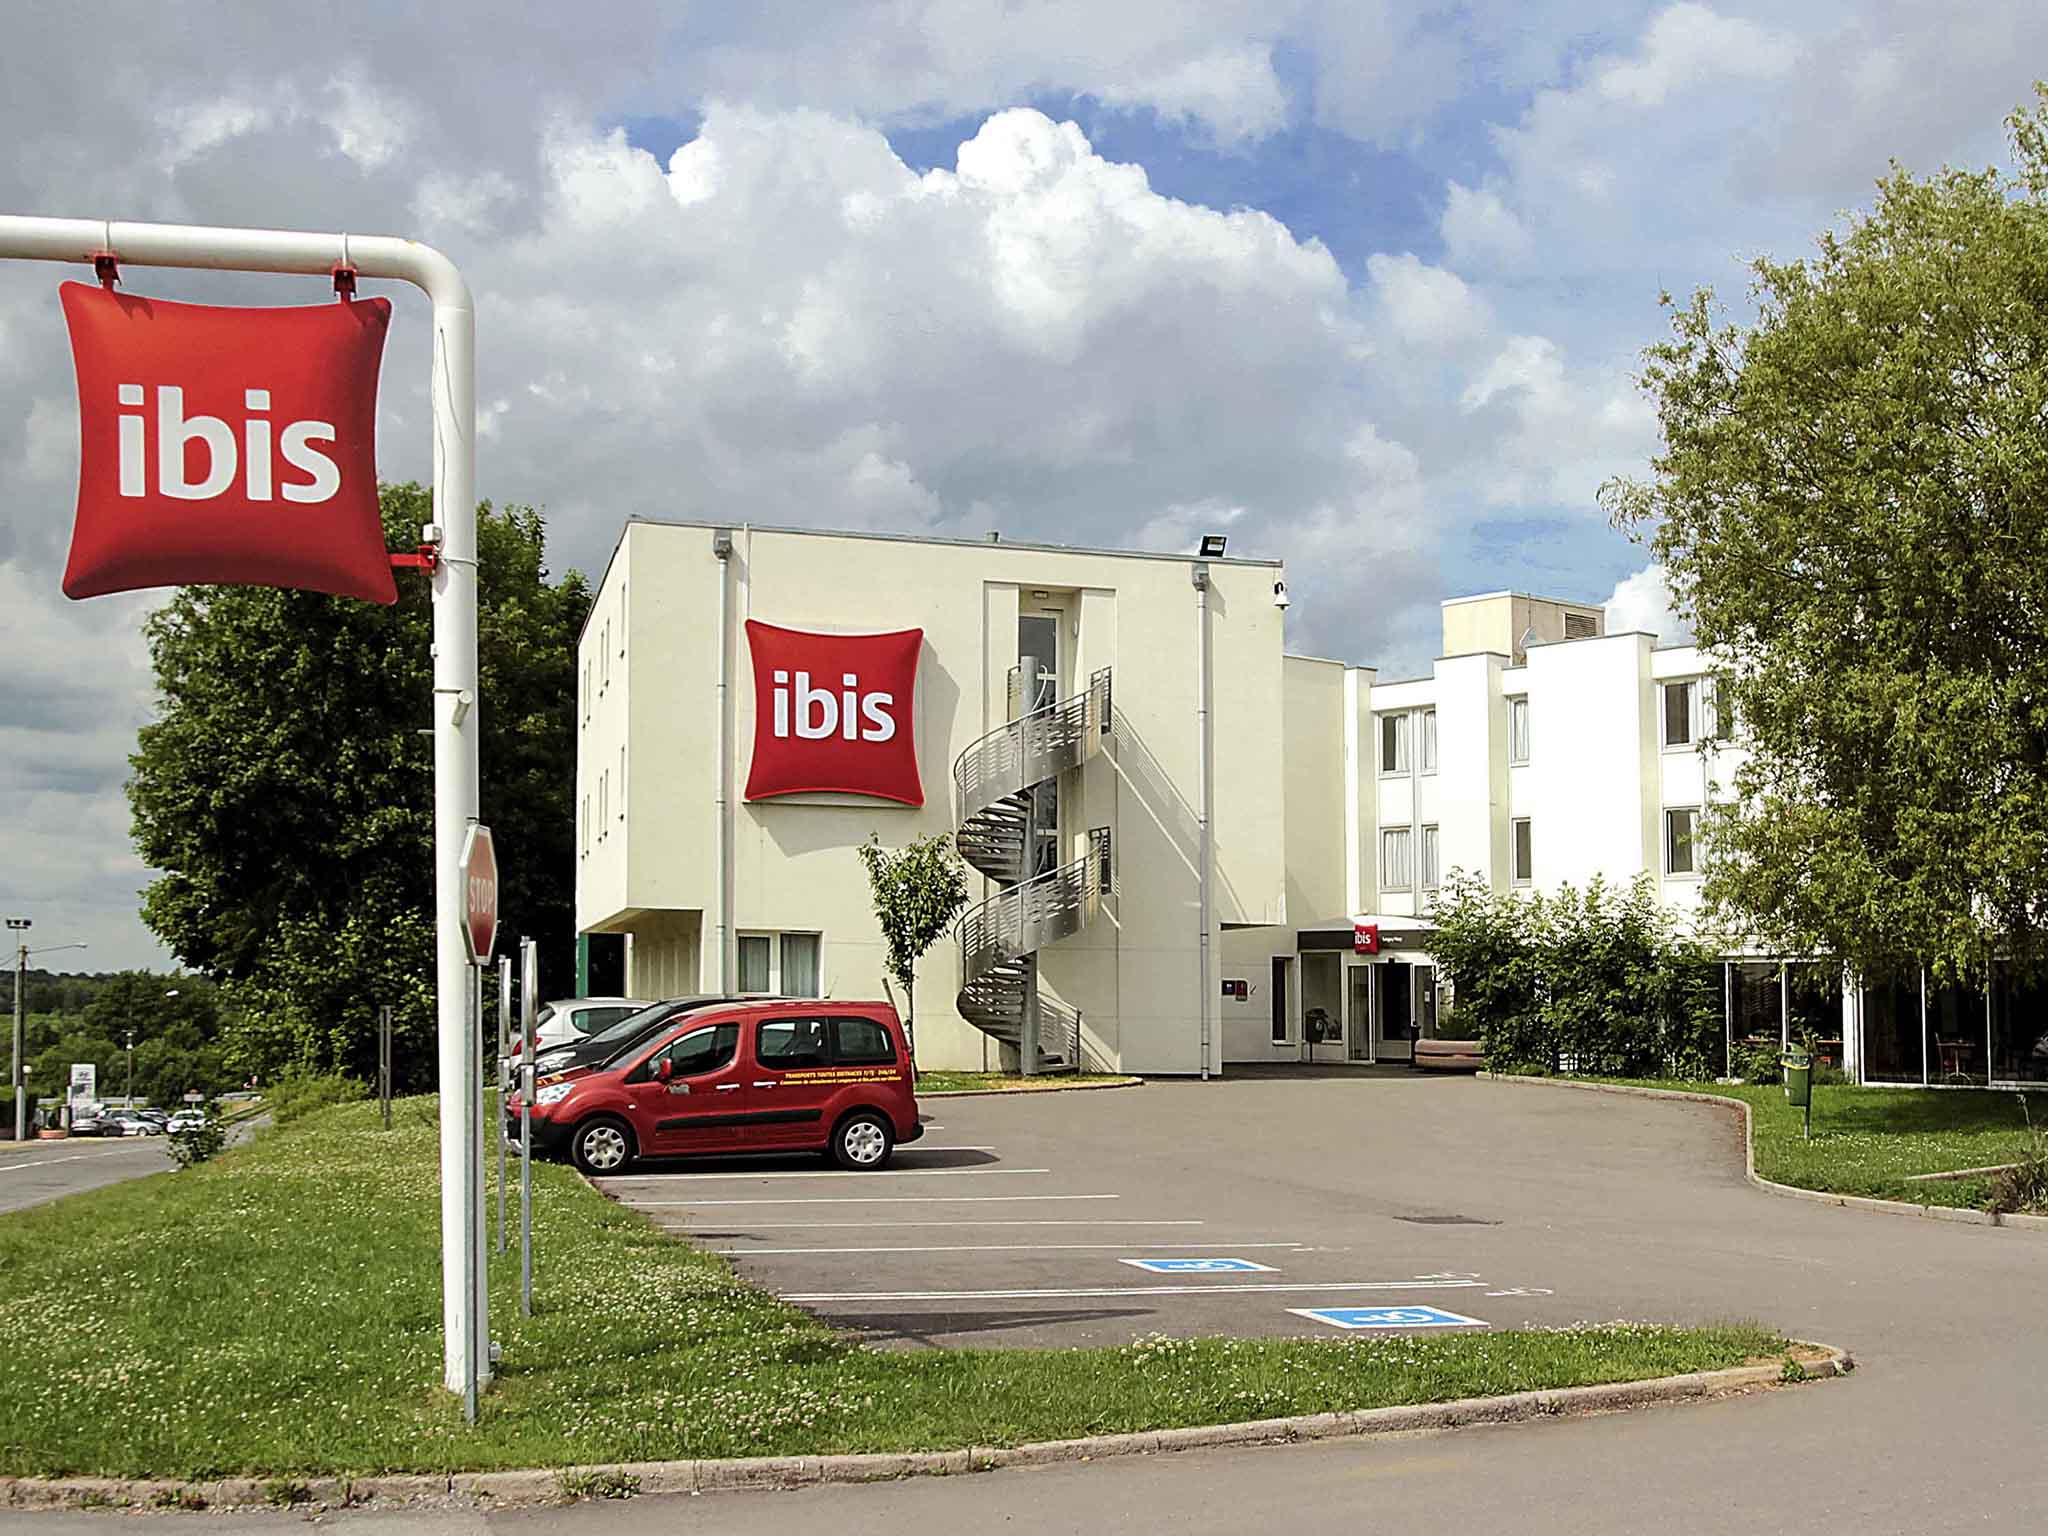 Hotel Ibis Mexy